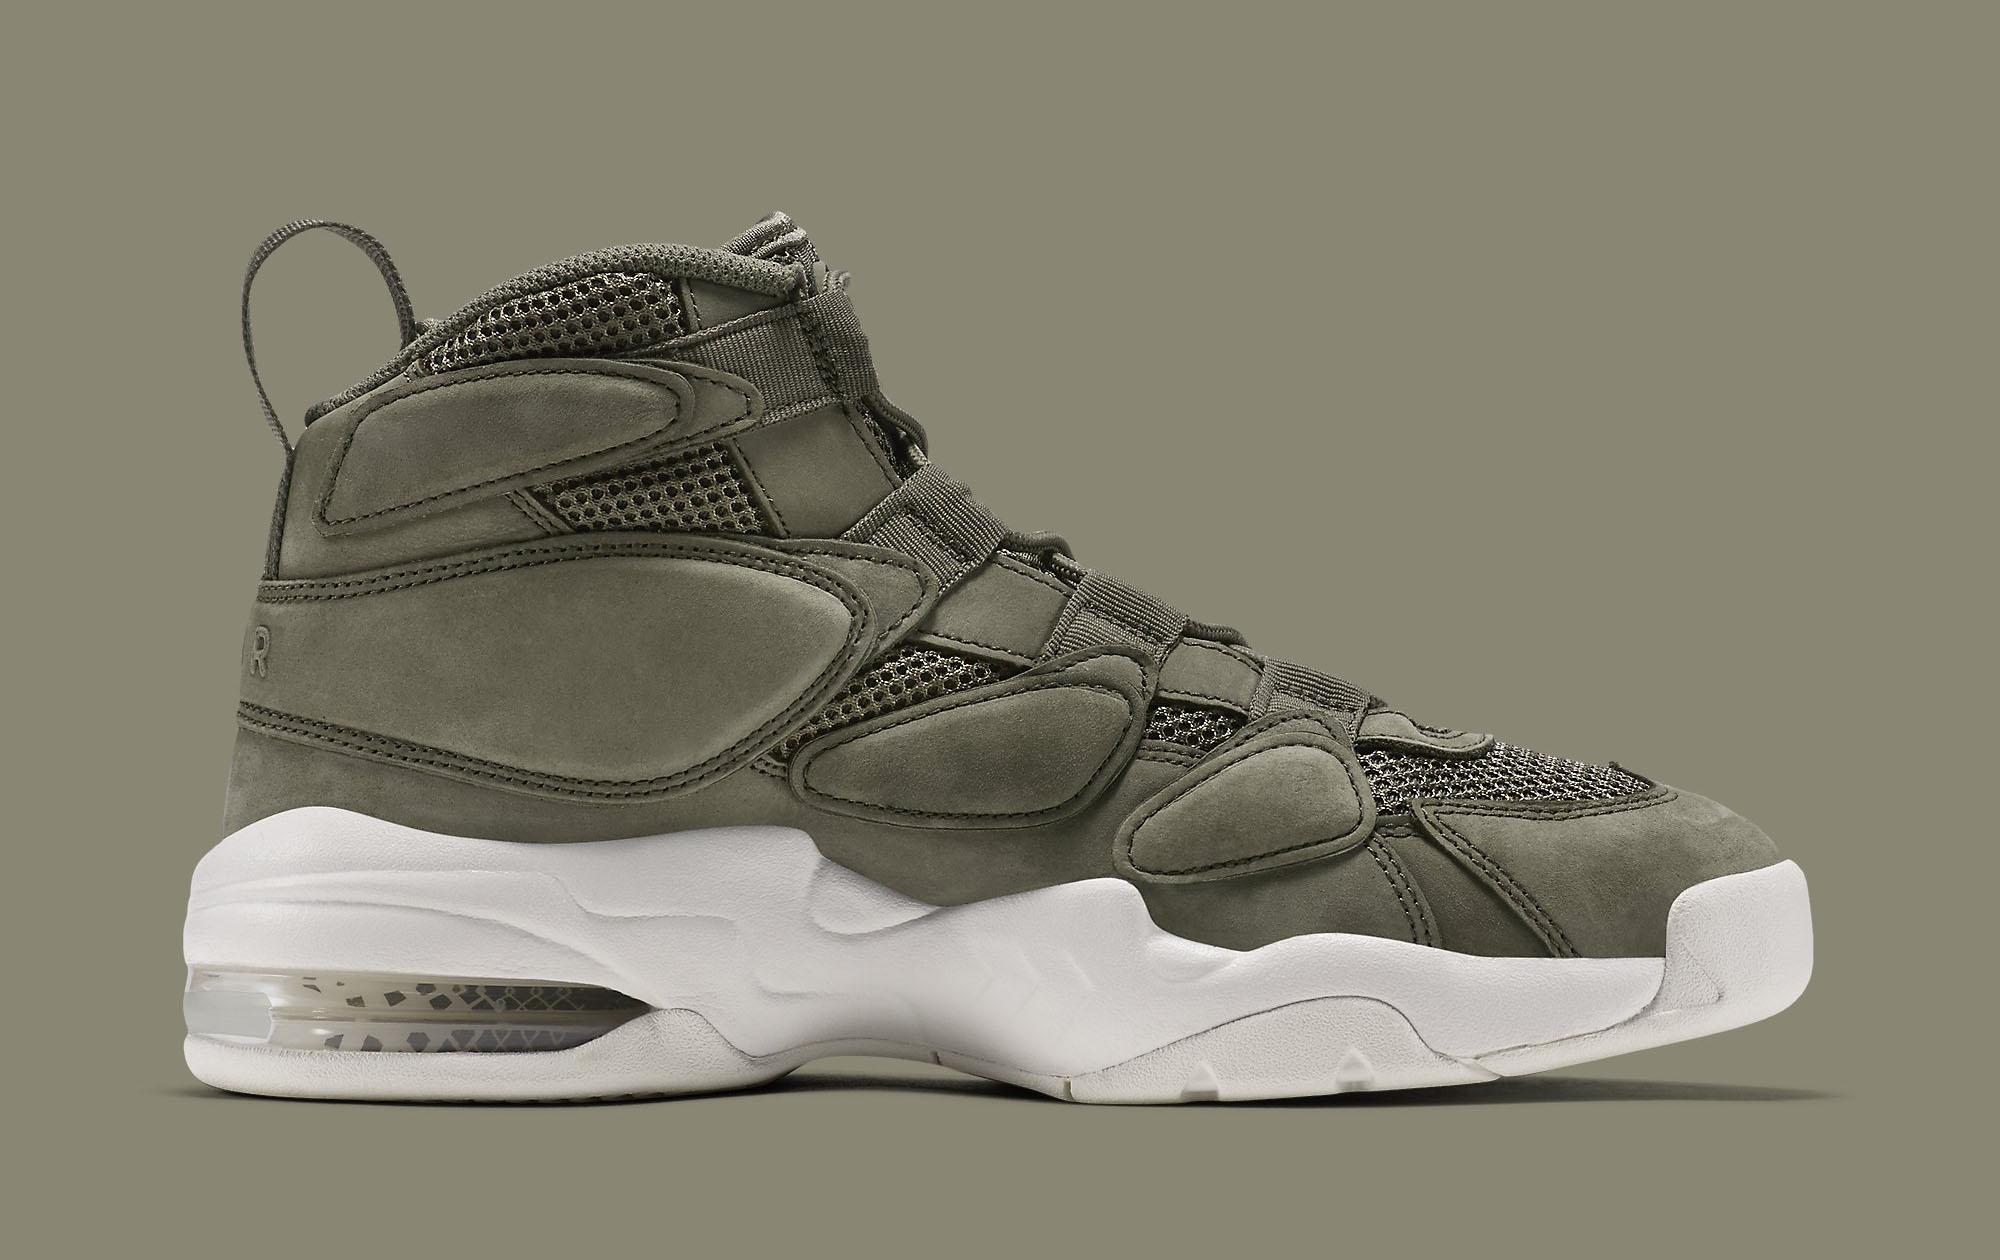 Image via Nike Nike Air Max Uptempo 2